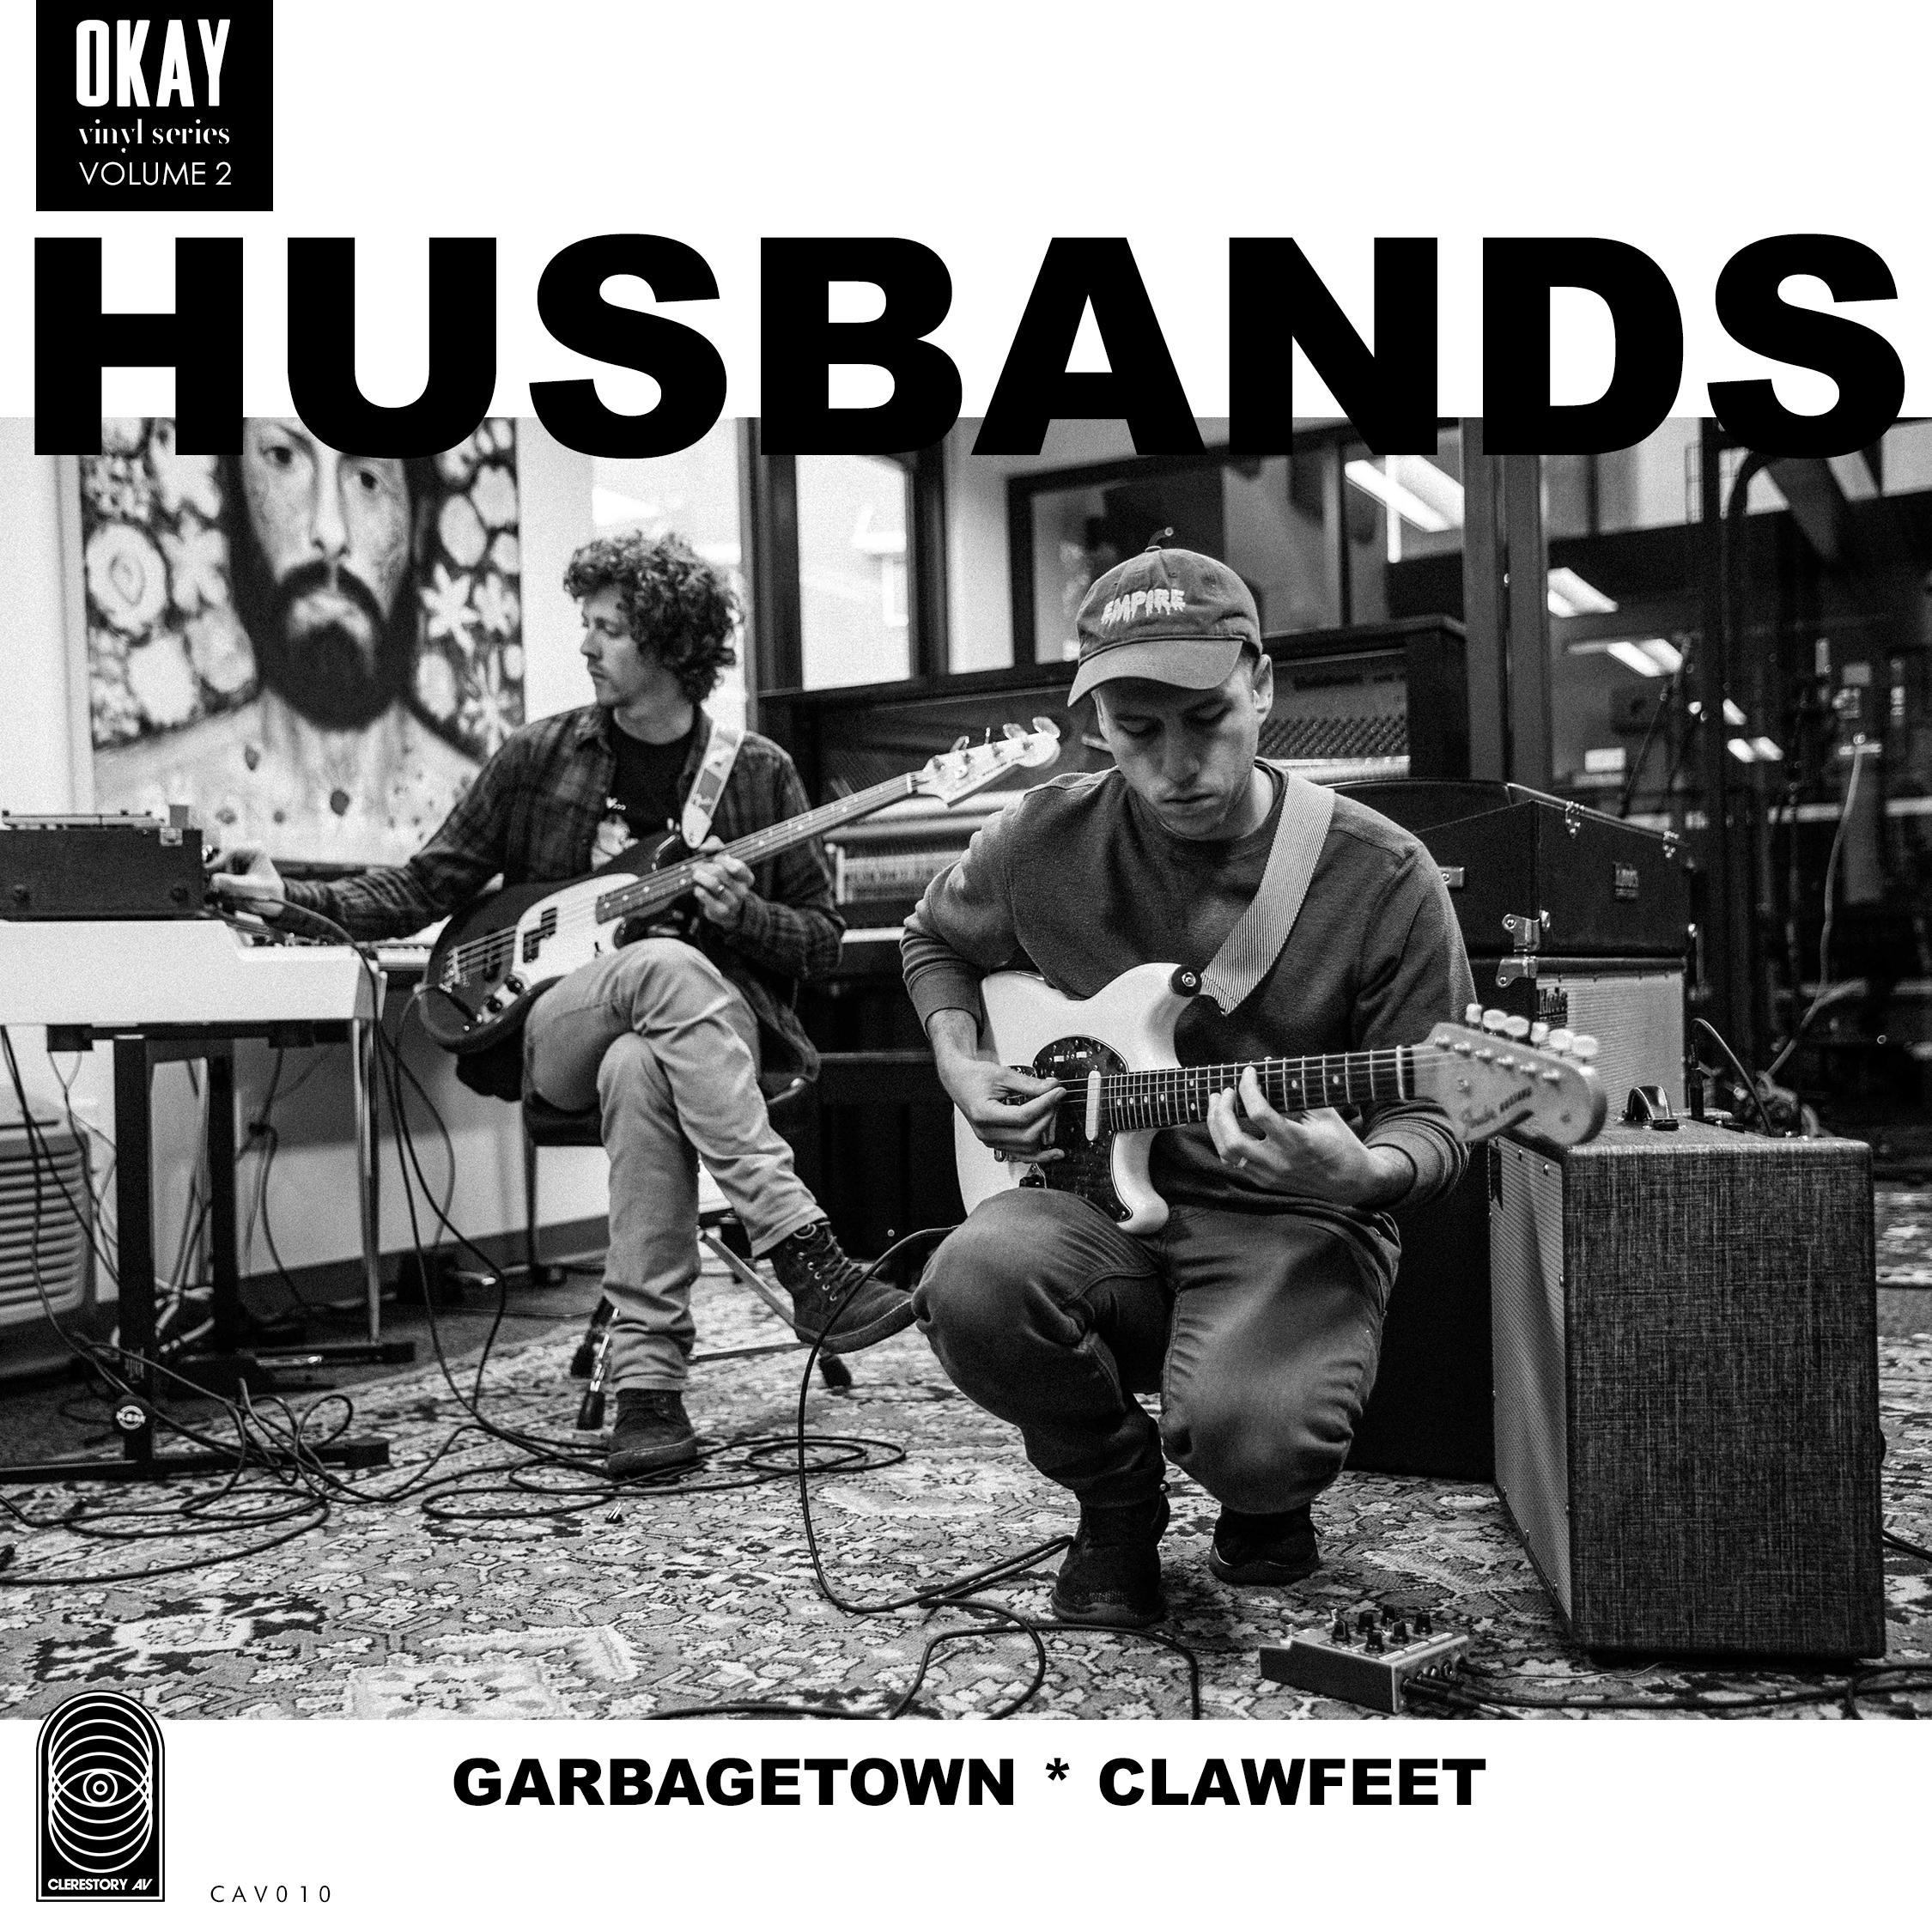 HUSBANDS / OKAY Vinyl Series Vol. 2